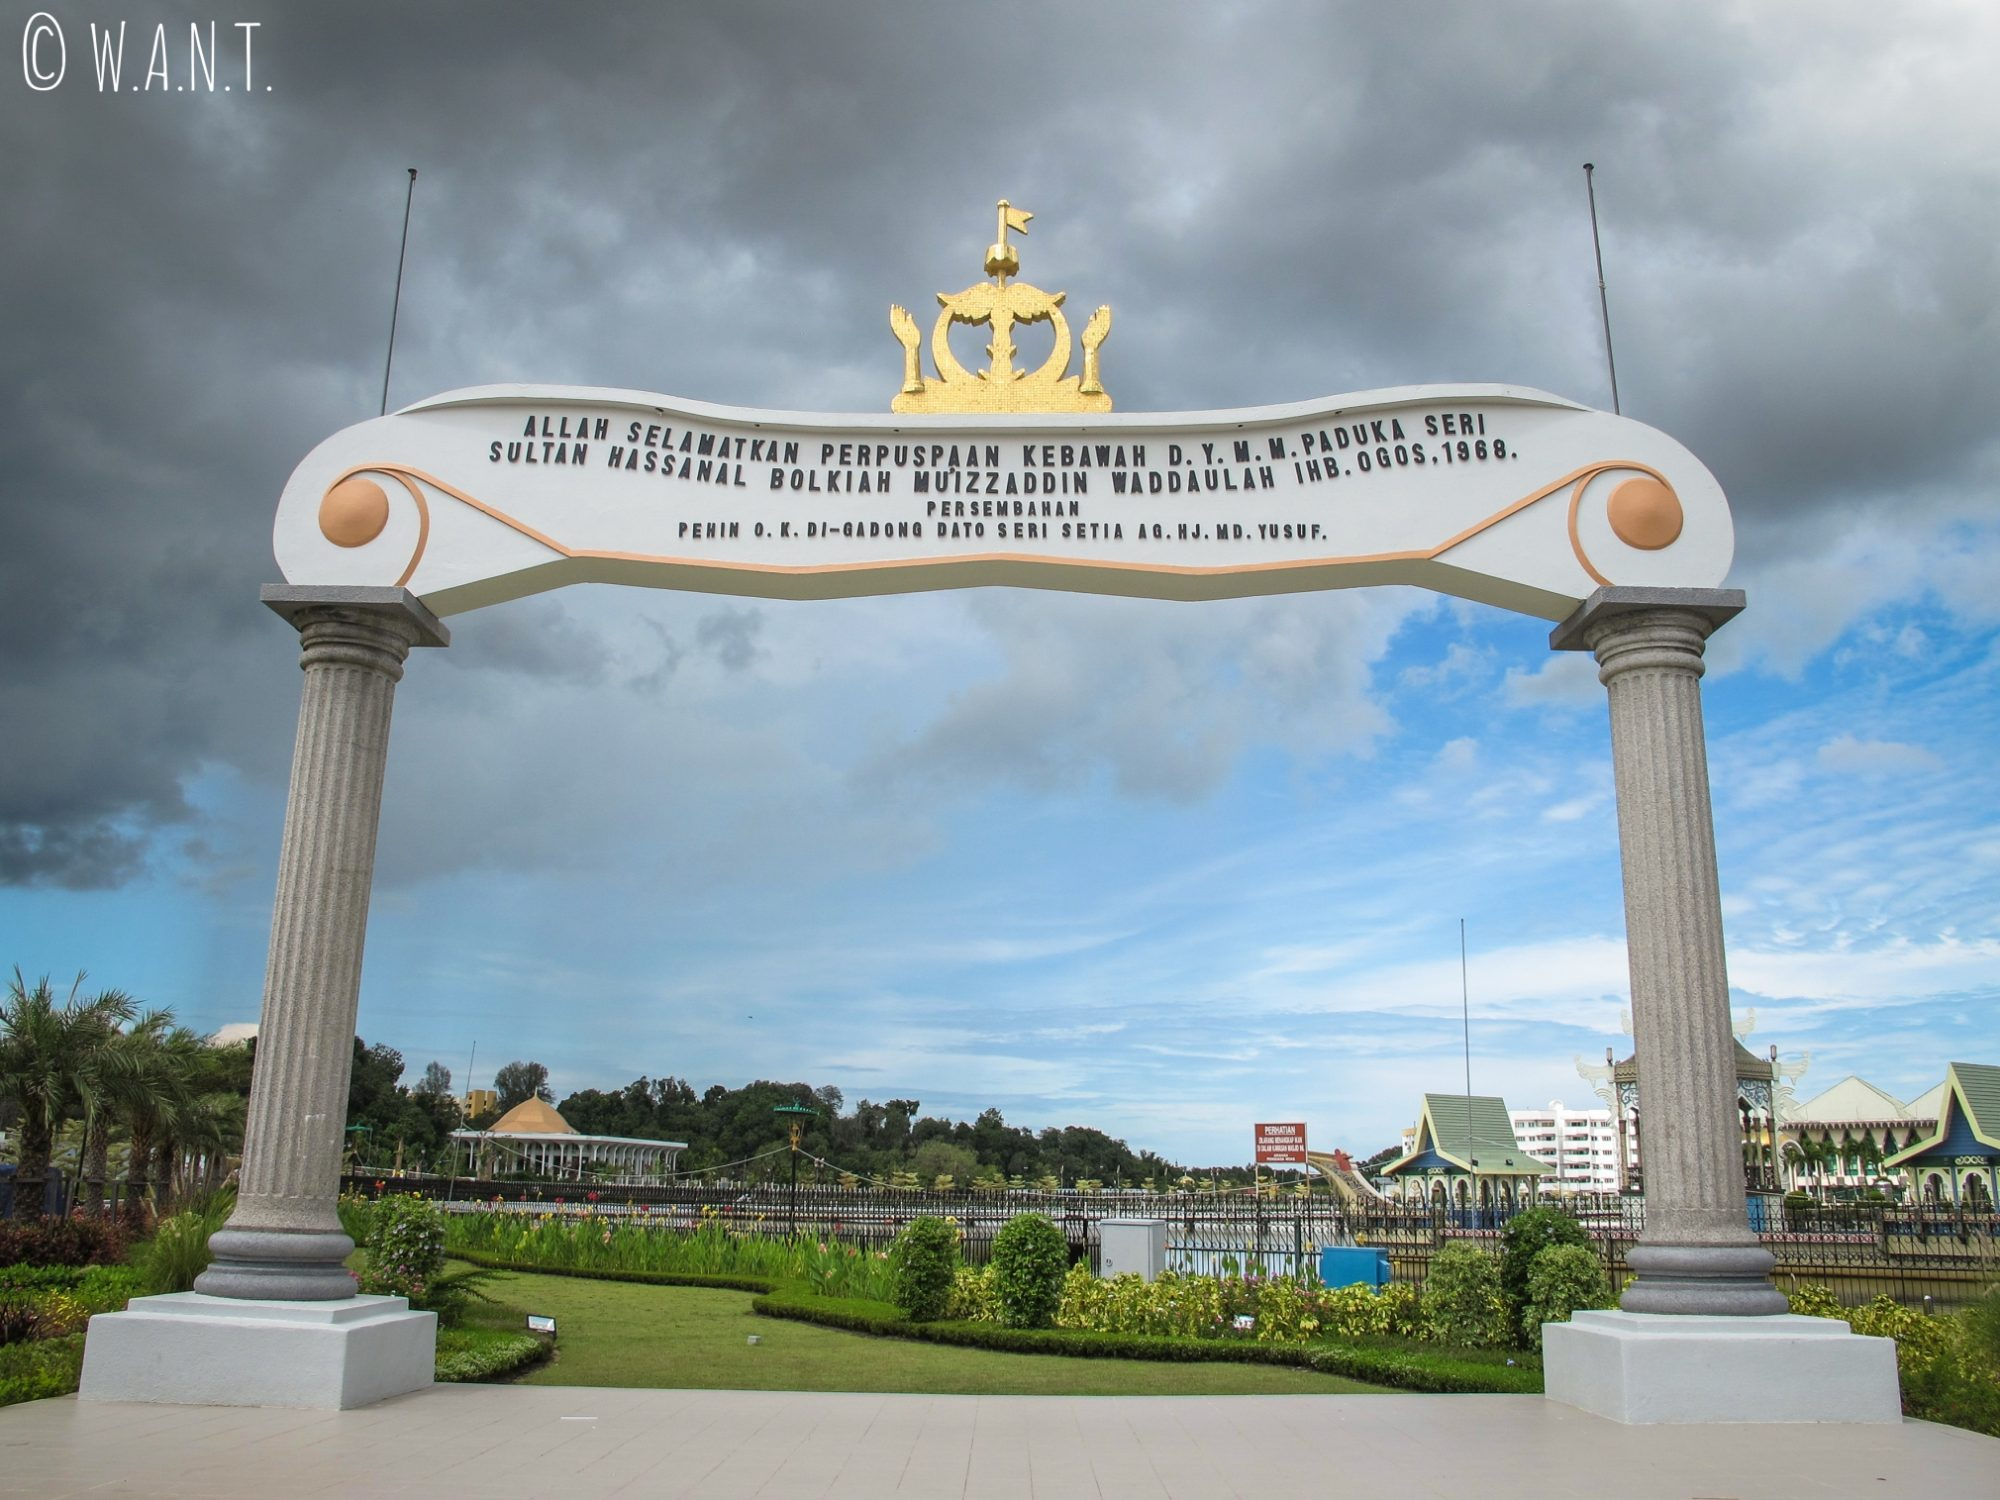 Porte dans le parc Taman Mahkota Jubli Emas de Bandar Seri Begawan